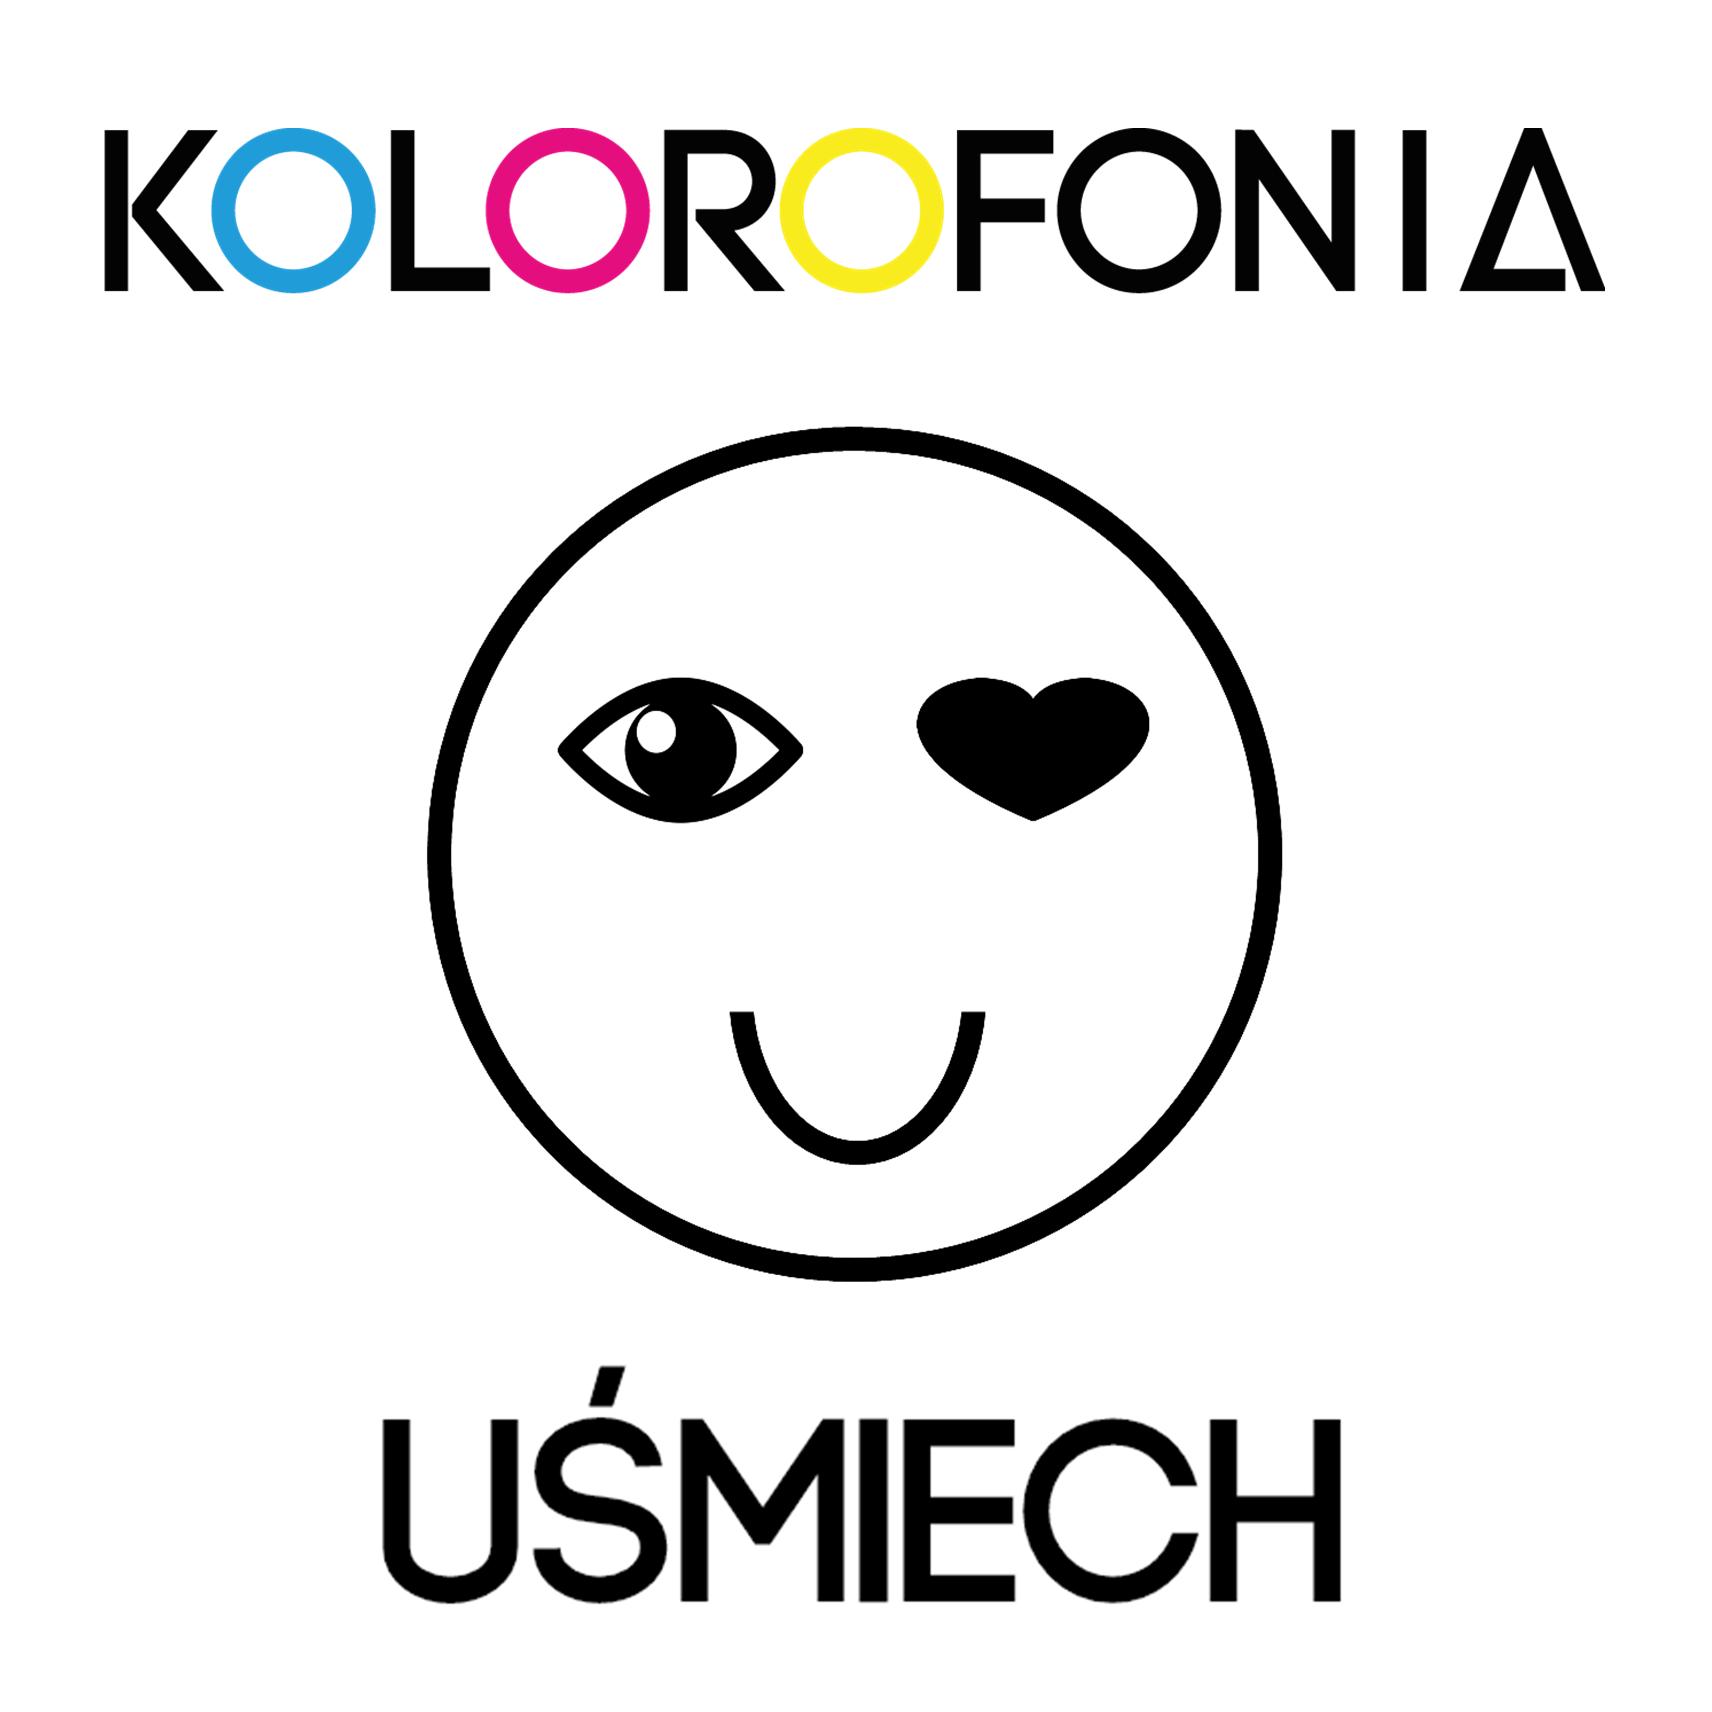 KOLOROFONIA - UŚMIECH - (radio cover)